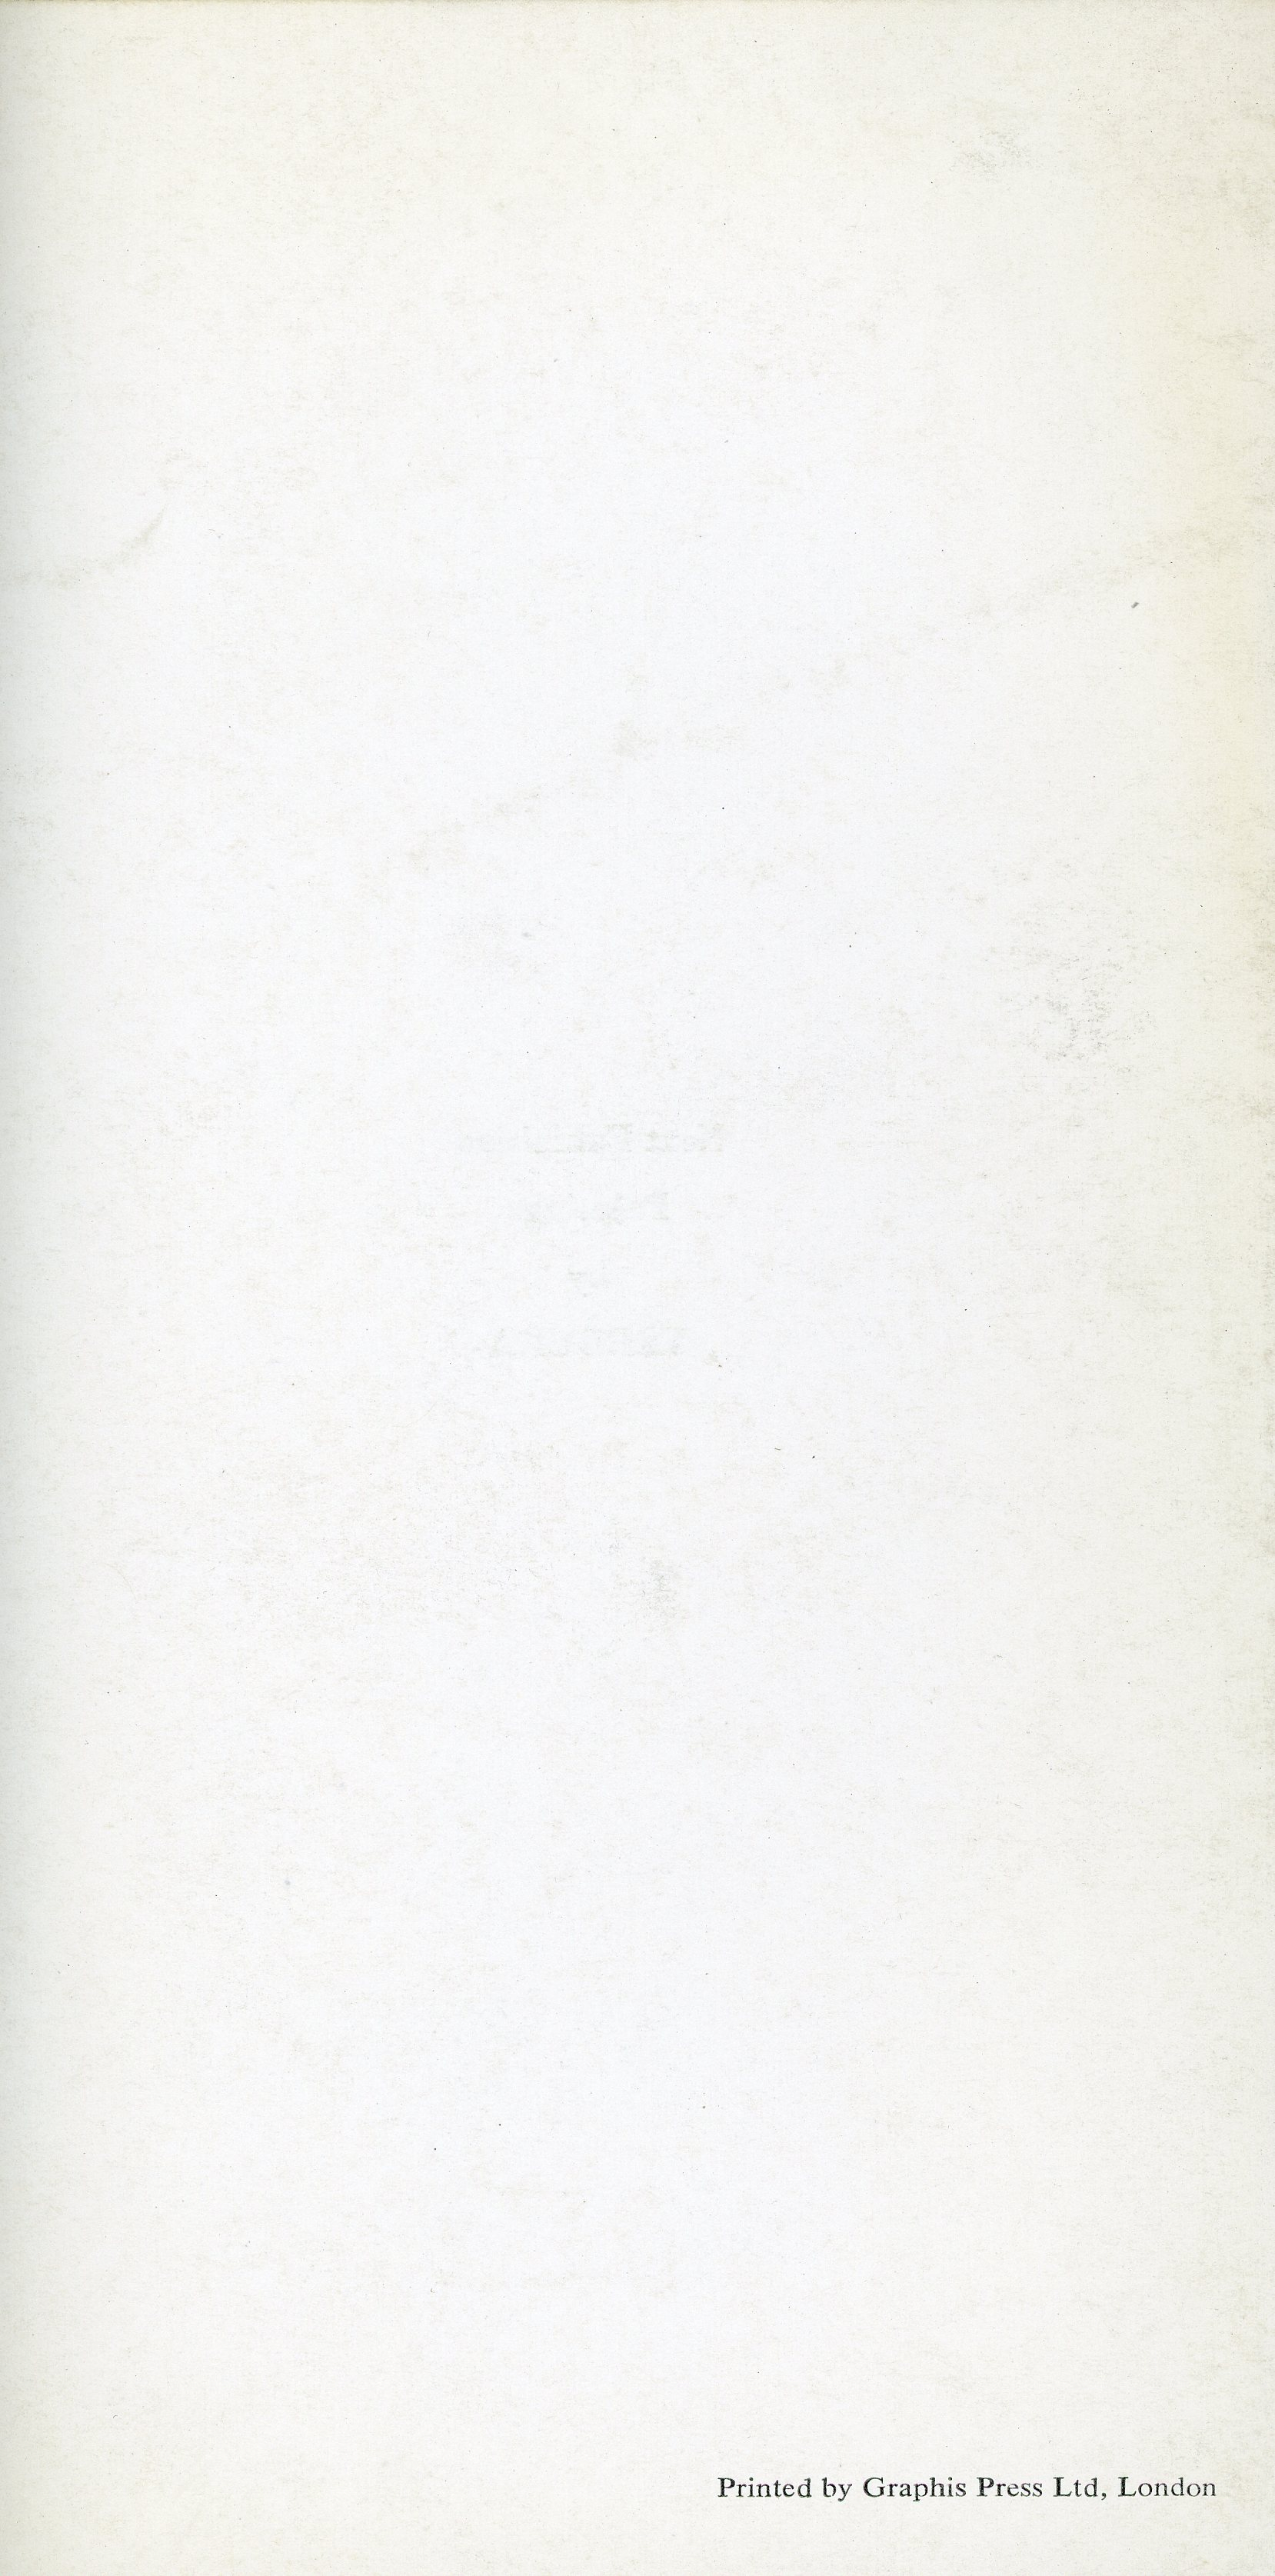 1958-09 Arthur Jeffress - Bruno Caruso_08.jpg